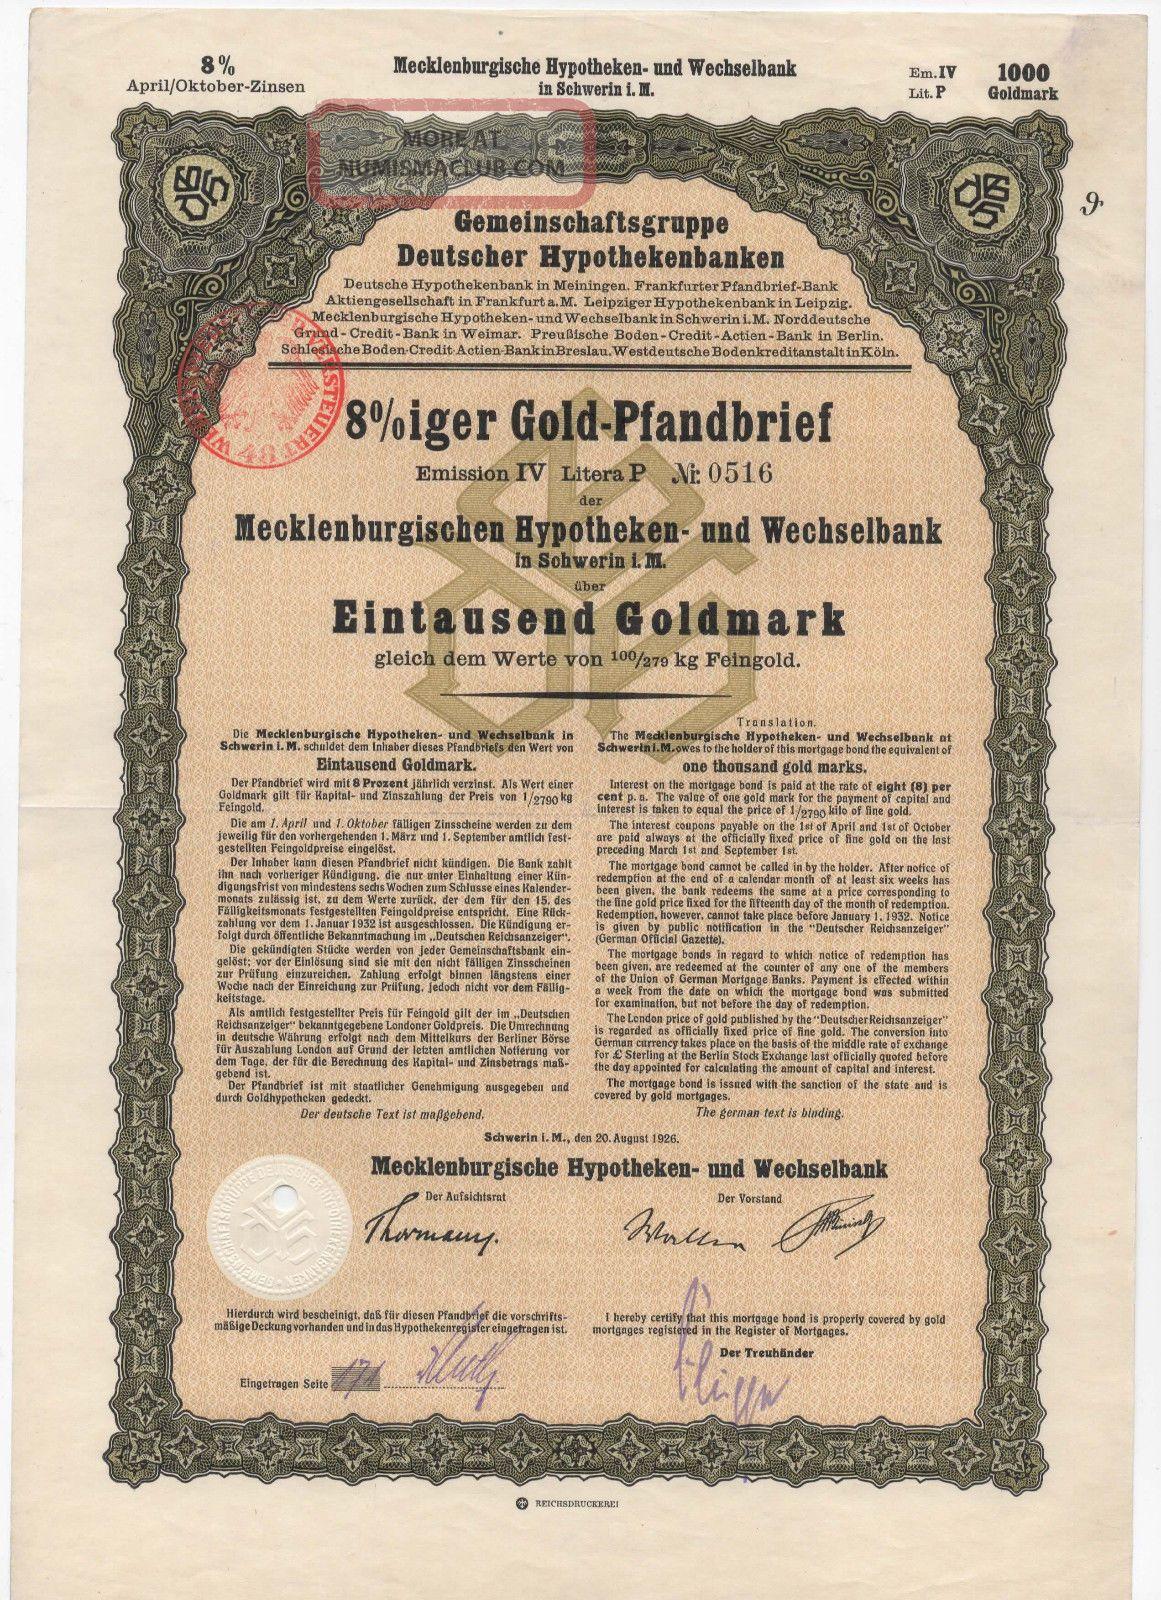 1926 8 Goldpfandbrief 1000 Goldmark Stock Bond Certificate Germany Stocks & Bonds, Scripophily photo